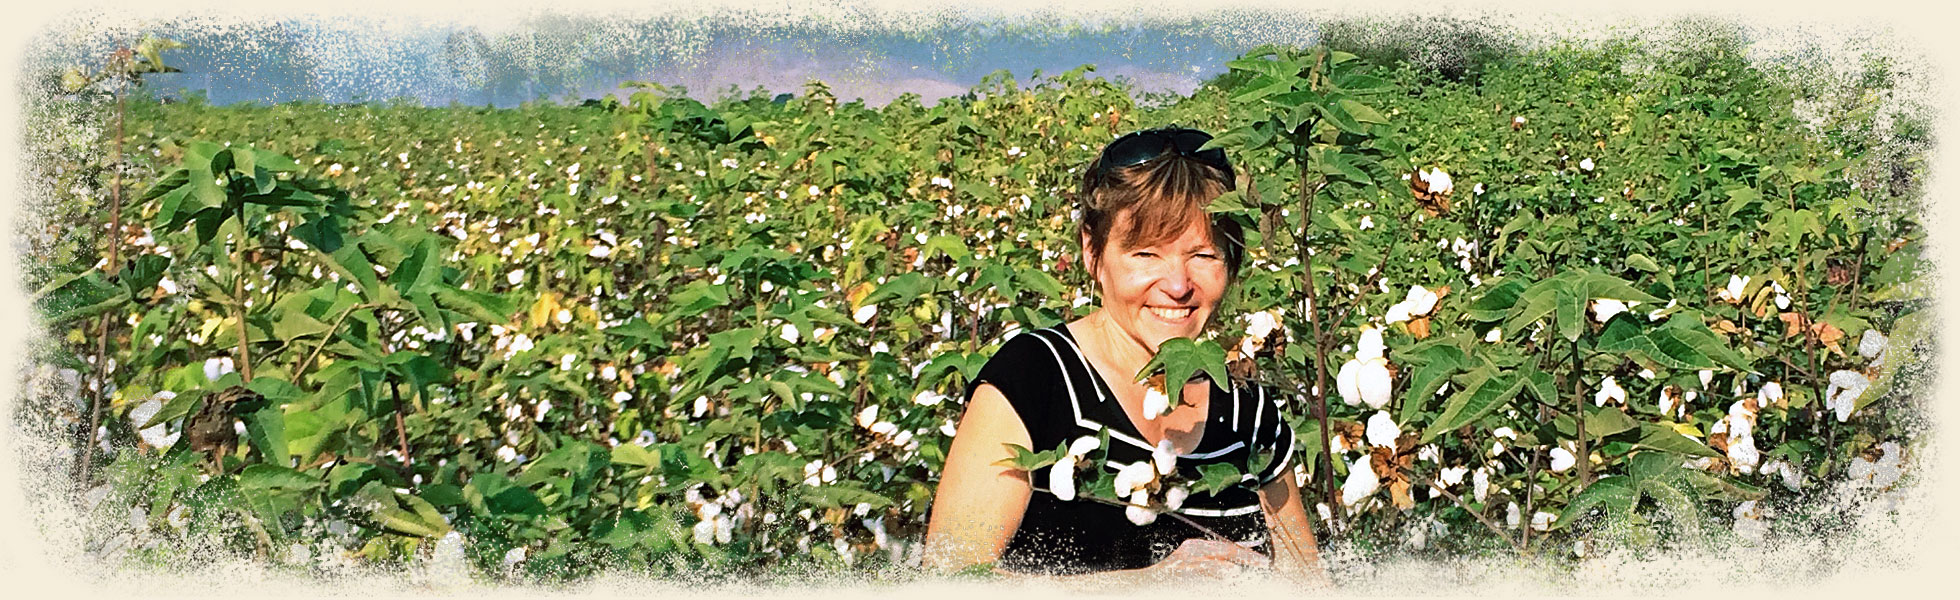 corn-to-organic-cotton-maggies-ban1.jpg